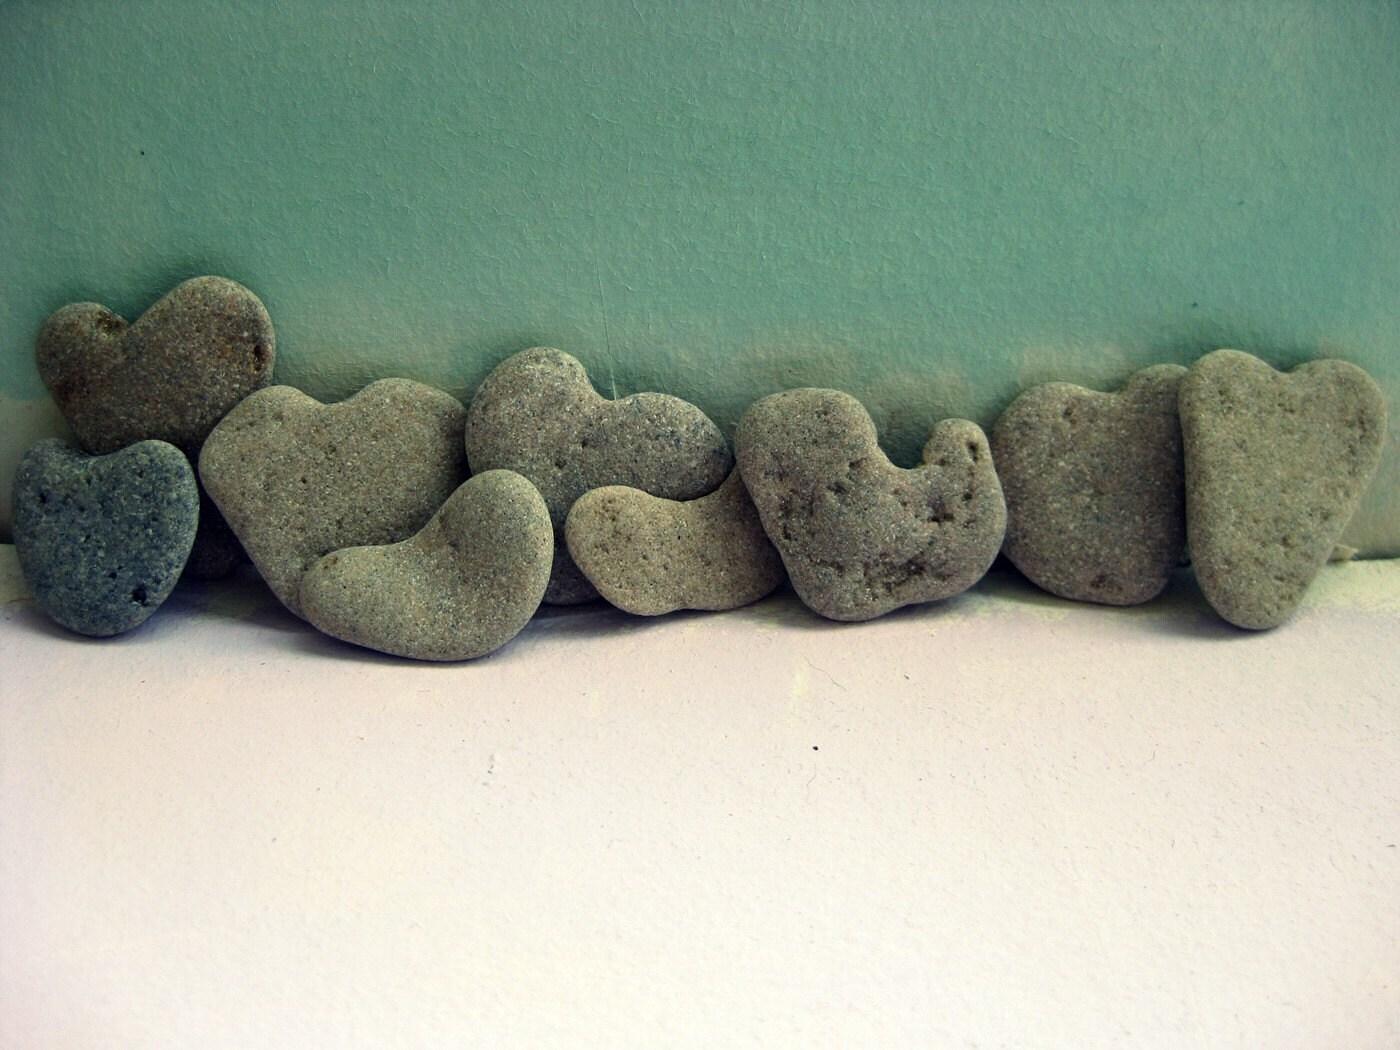 SALE 20% OFF Beach Wedding Decor - 16 genuine  heart shaped beach stones